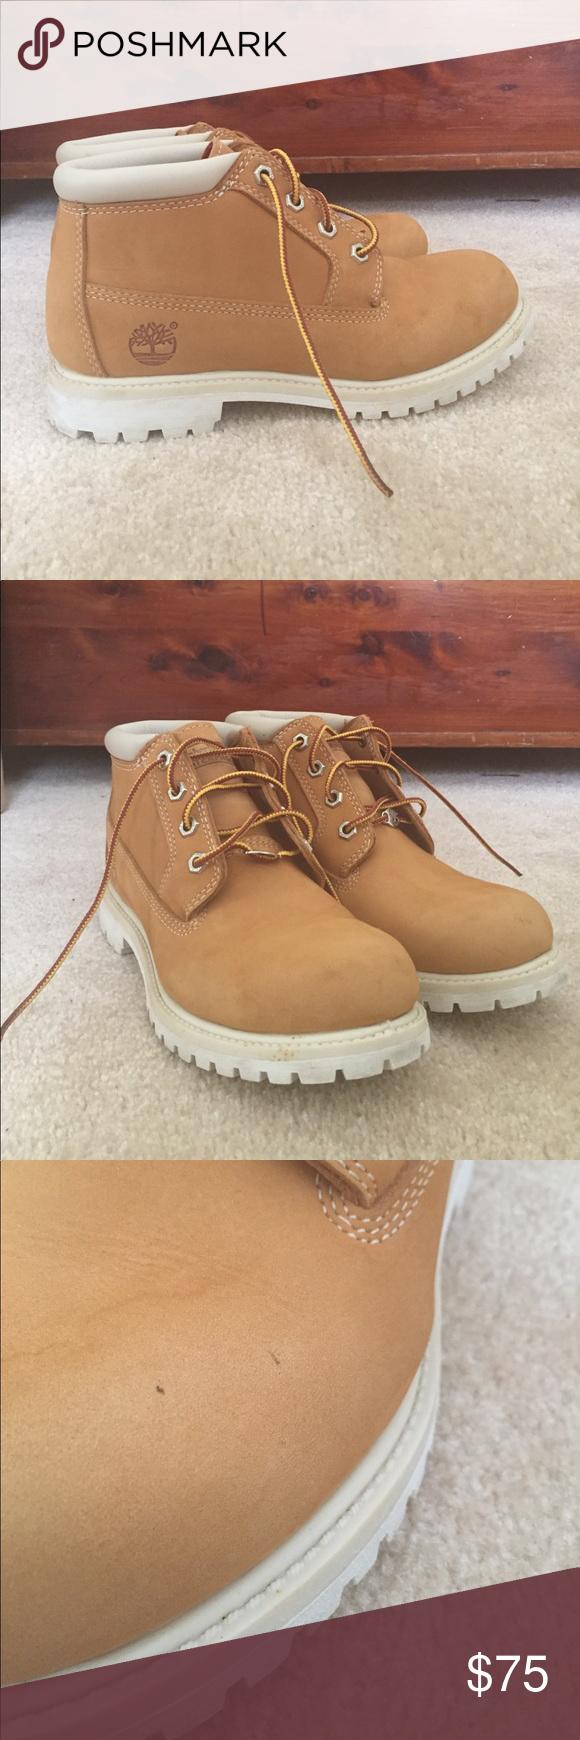 Timberland Women's Nellie Chukka Boots